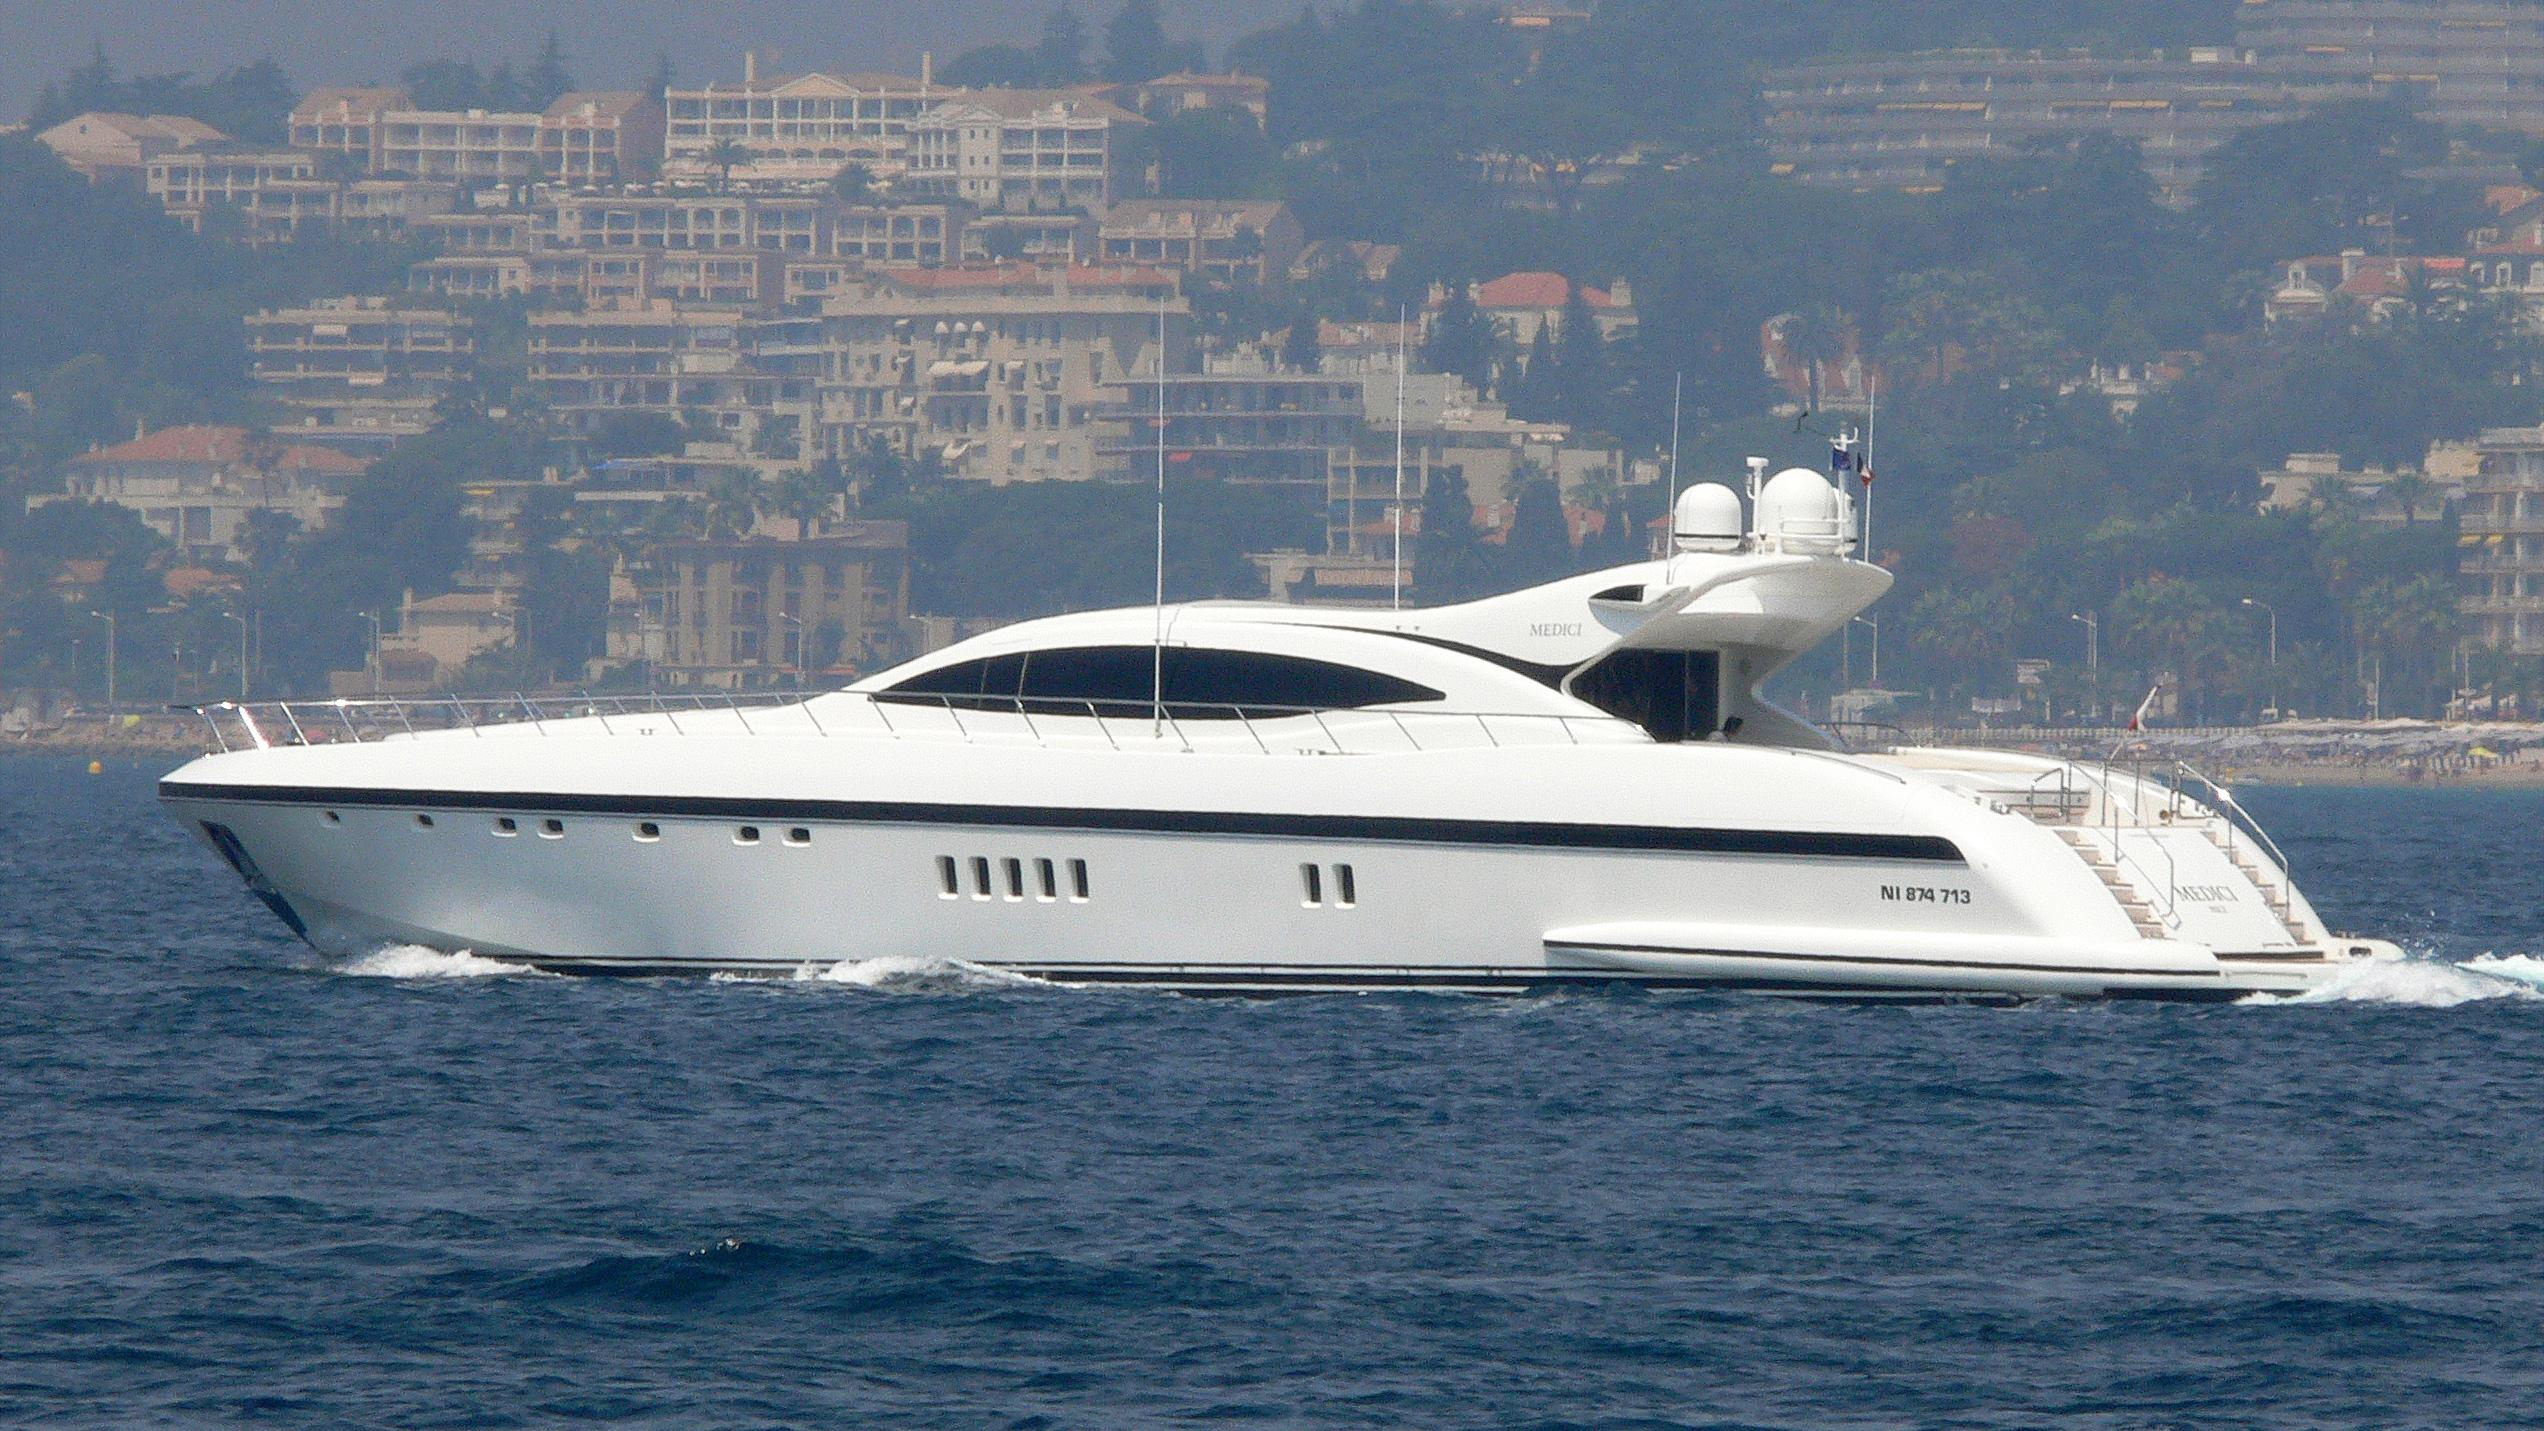 naisca-v-motor-yacht-overmarine-mangusta-108-sport-profile